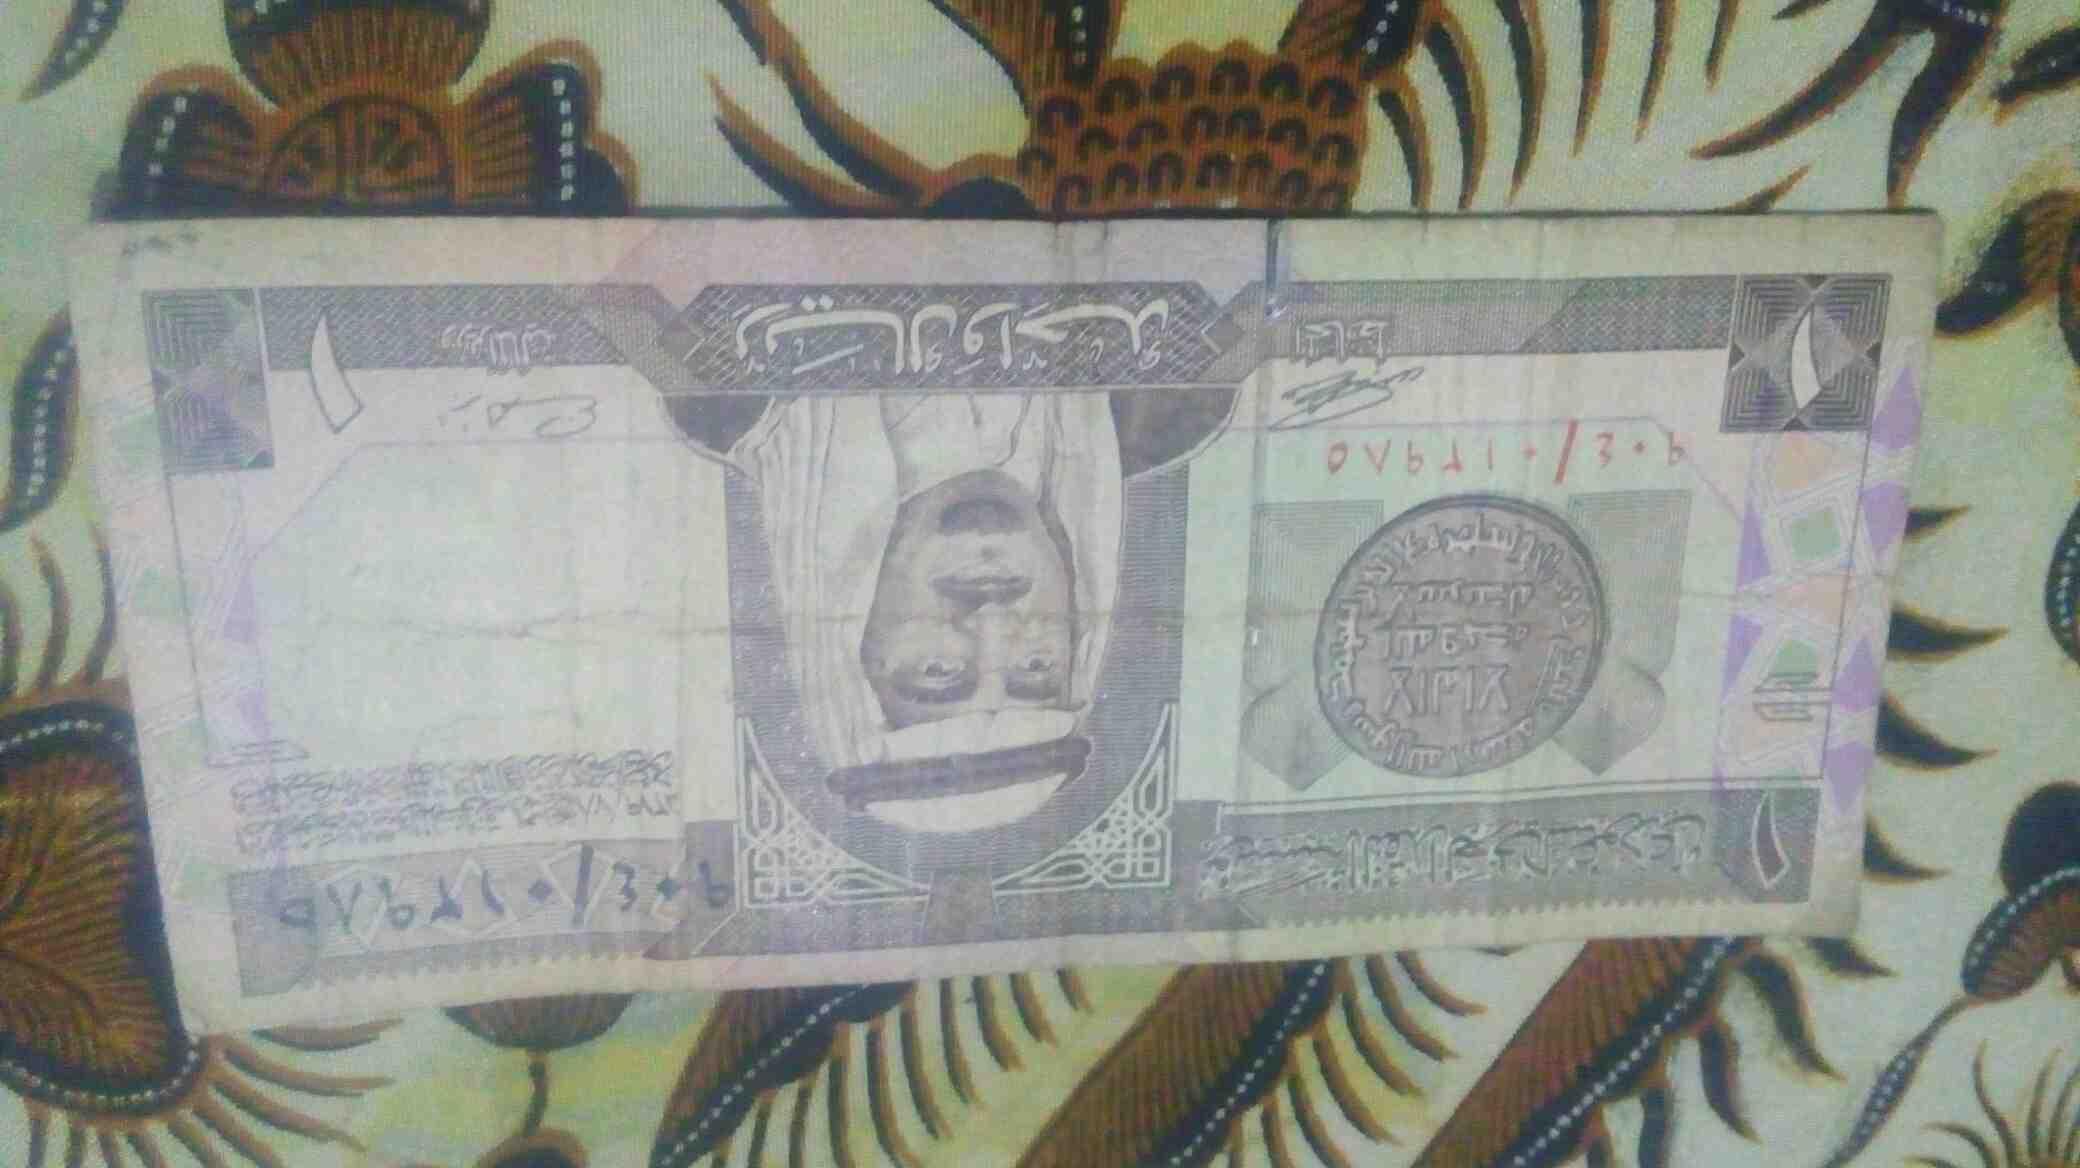 Foto: Uang Arab One Riyal